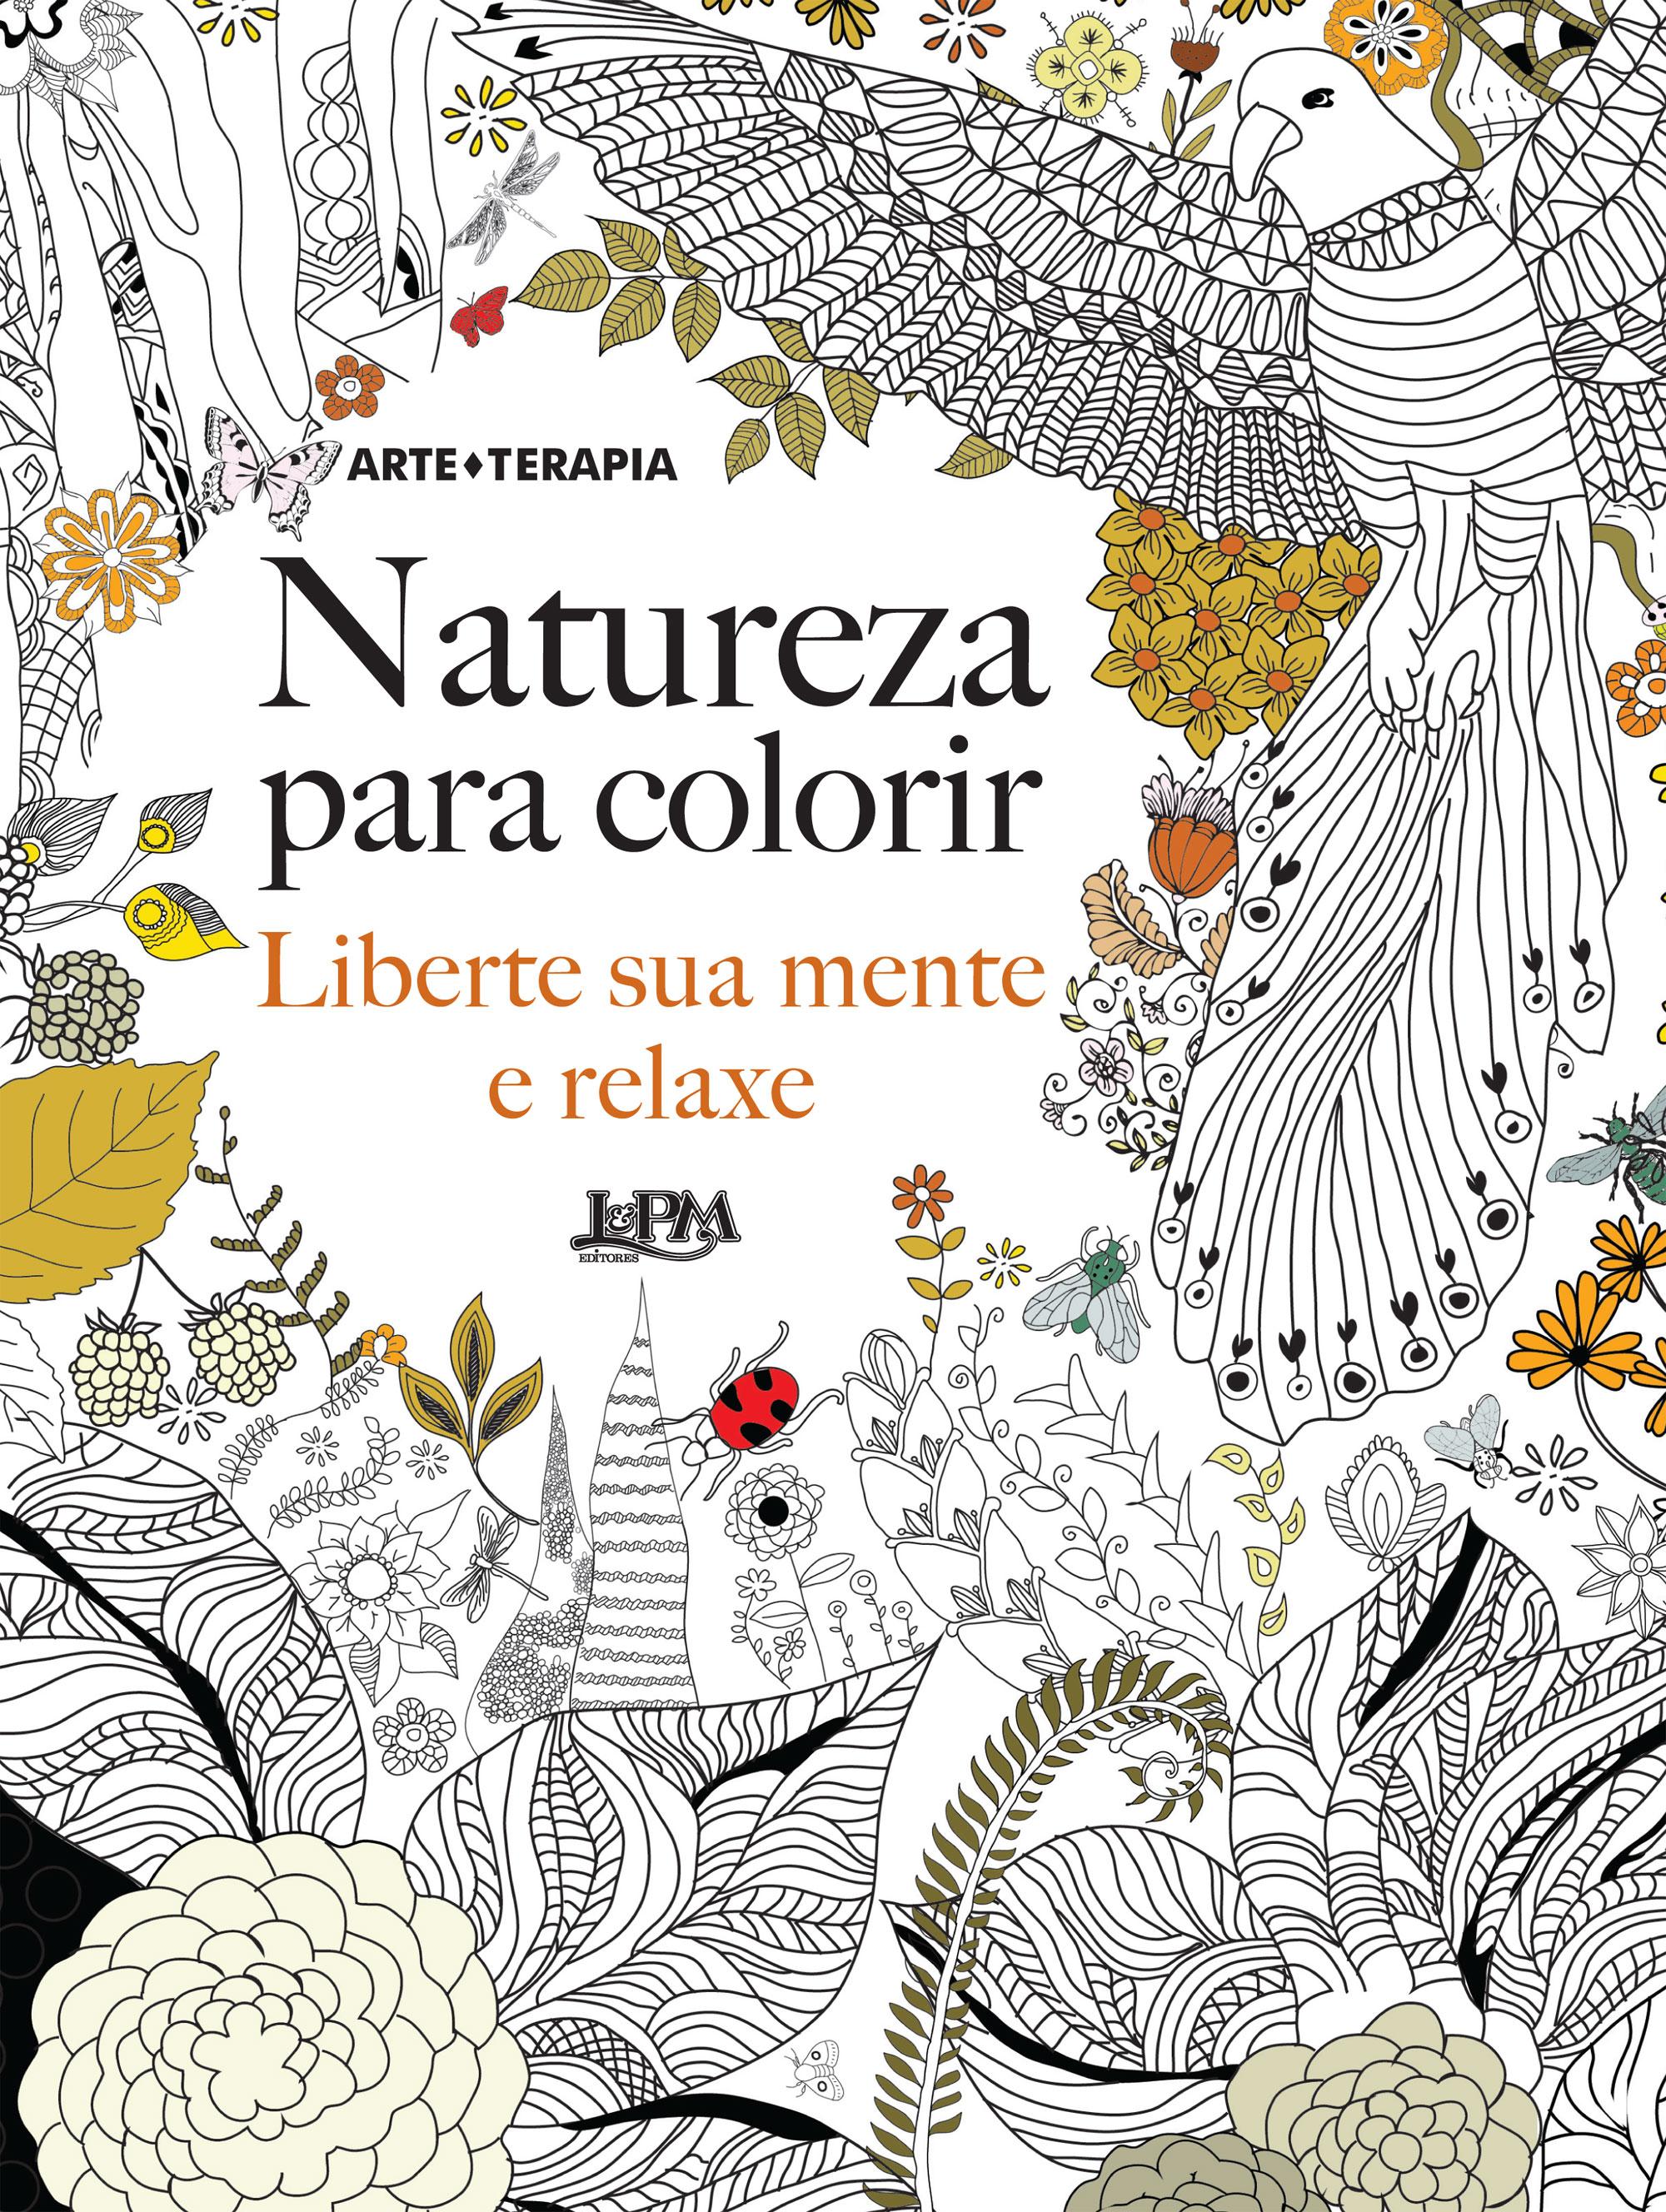 natureza para colorir liberte sua mente e relaxe christina rose